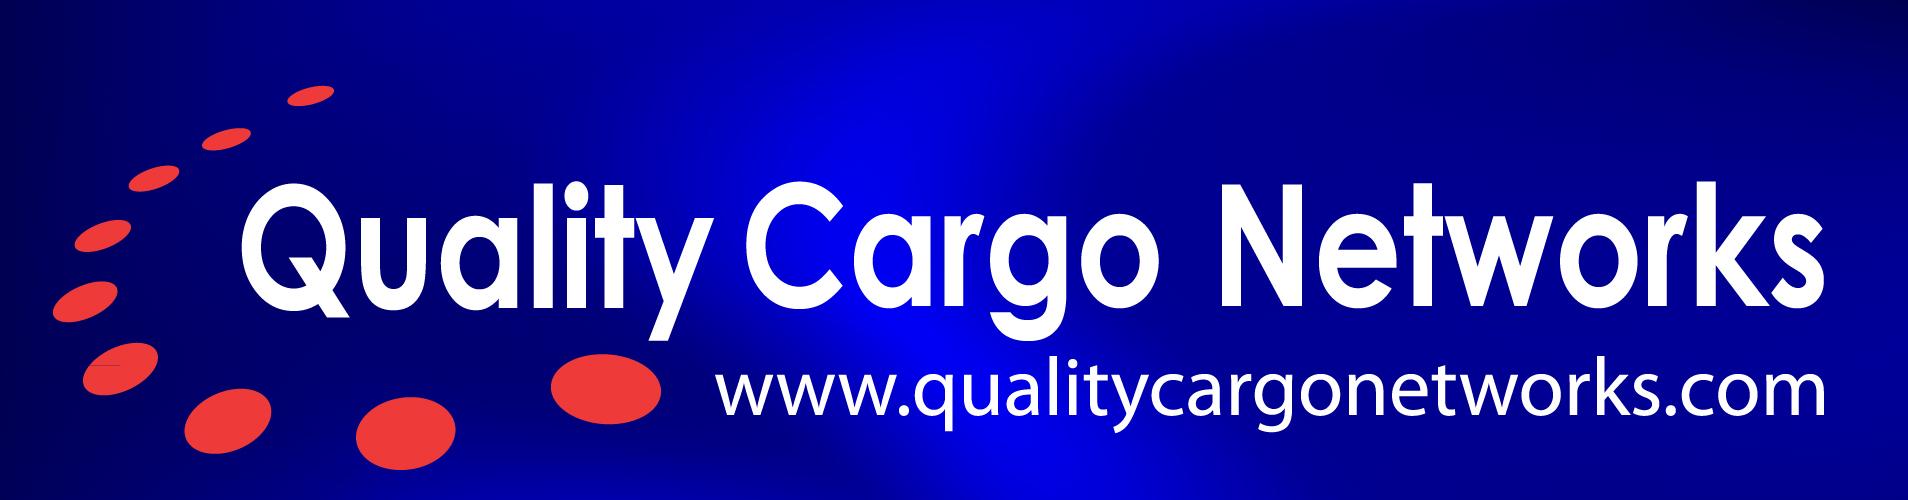 QCN_logo_blue.jpg